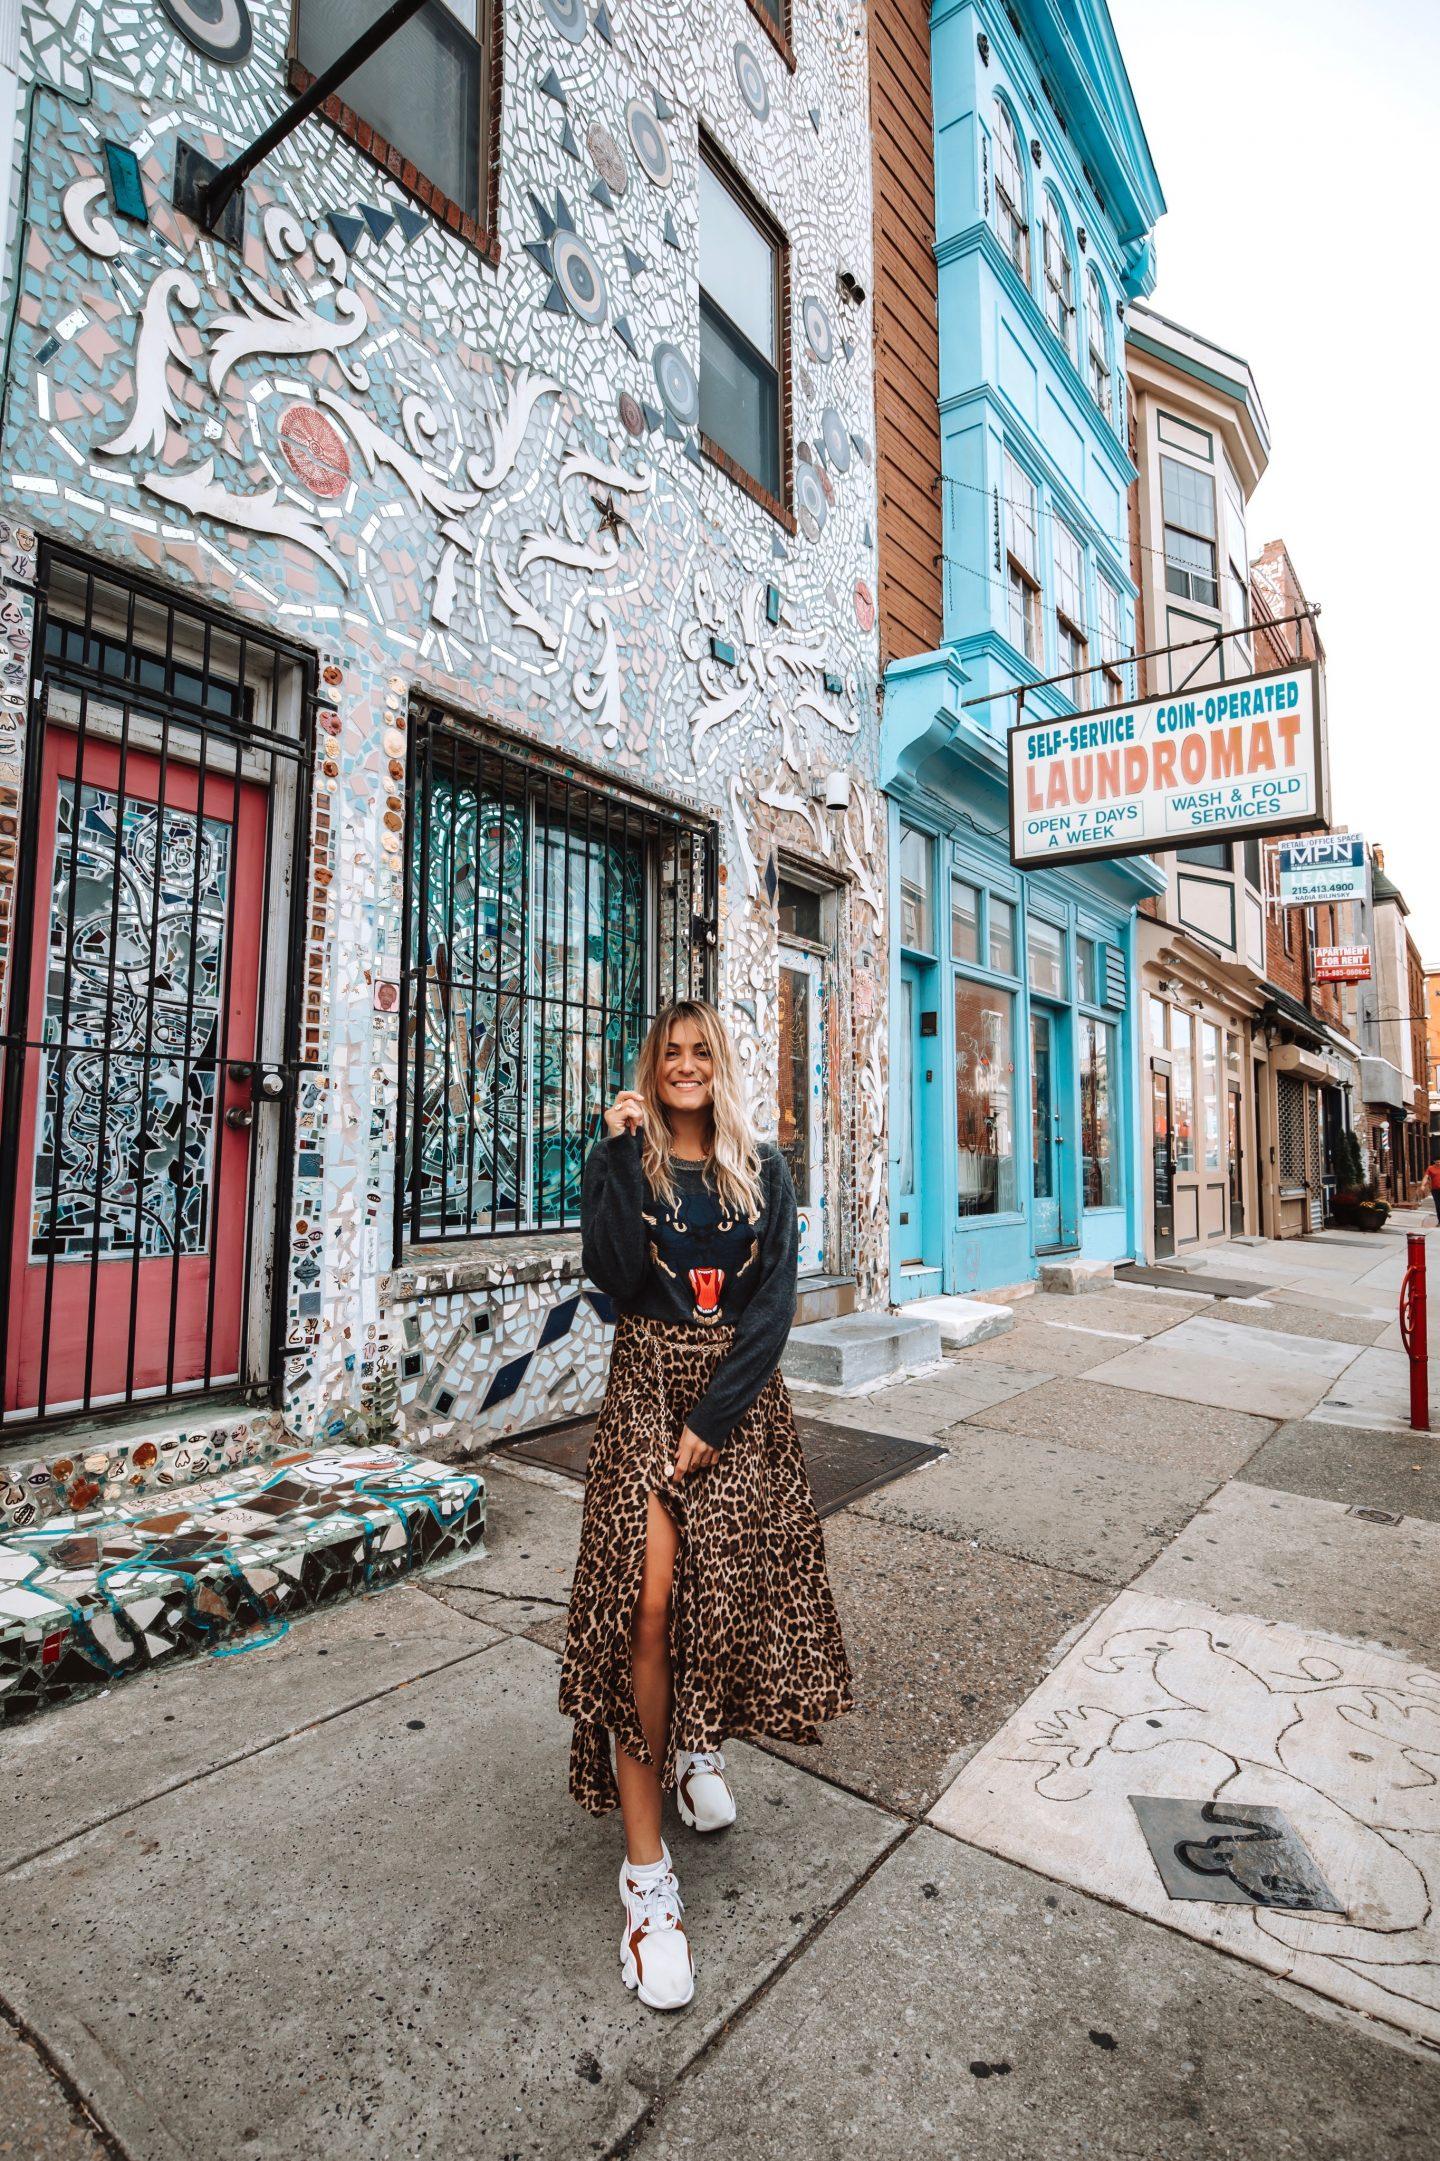 Visiter Philadelphie USA - Blondie Baby blog voyages et mode